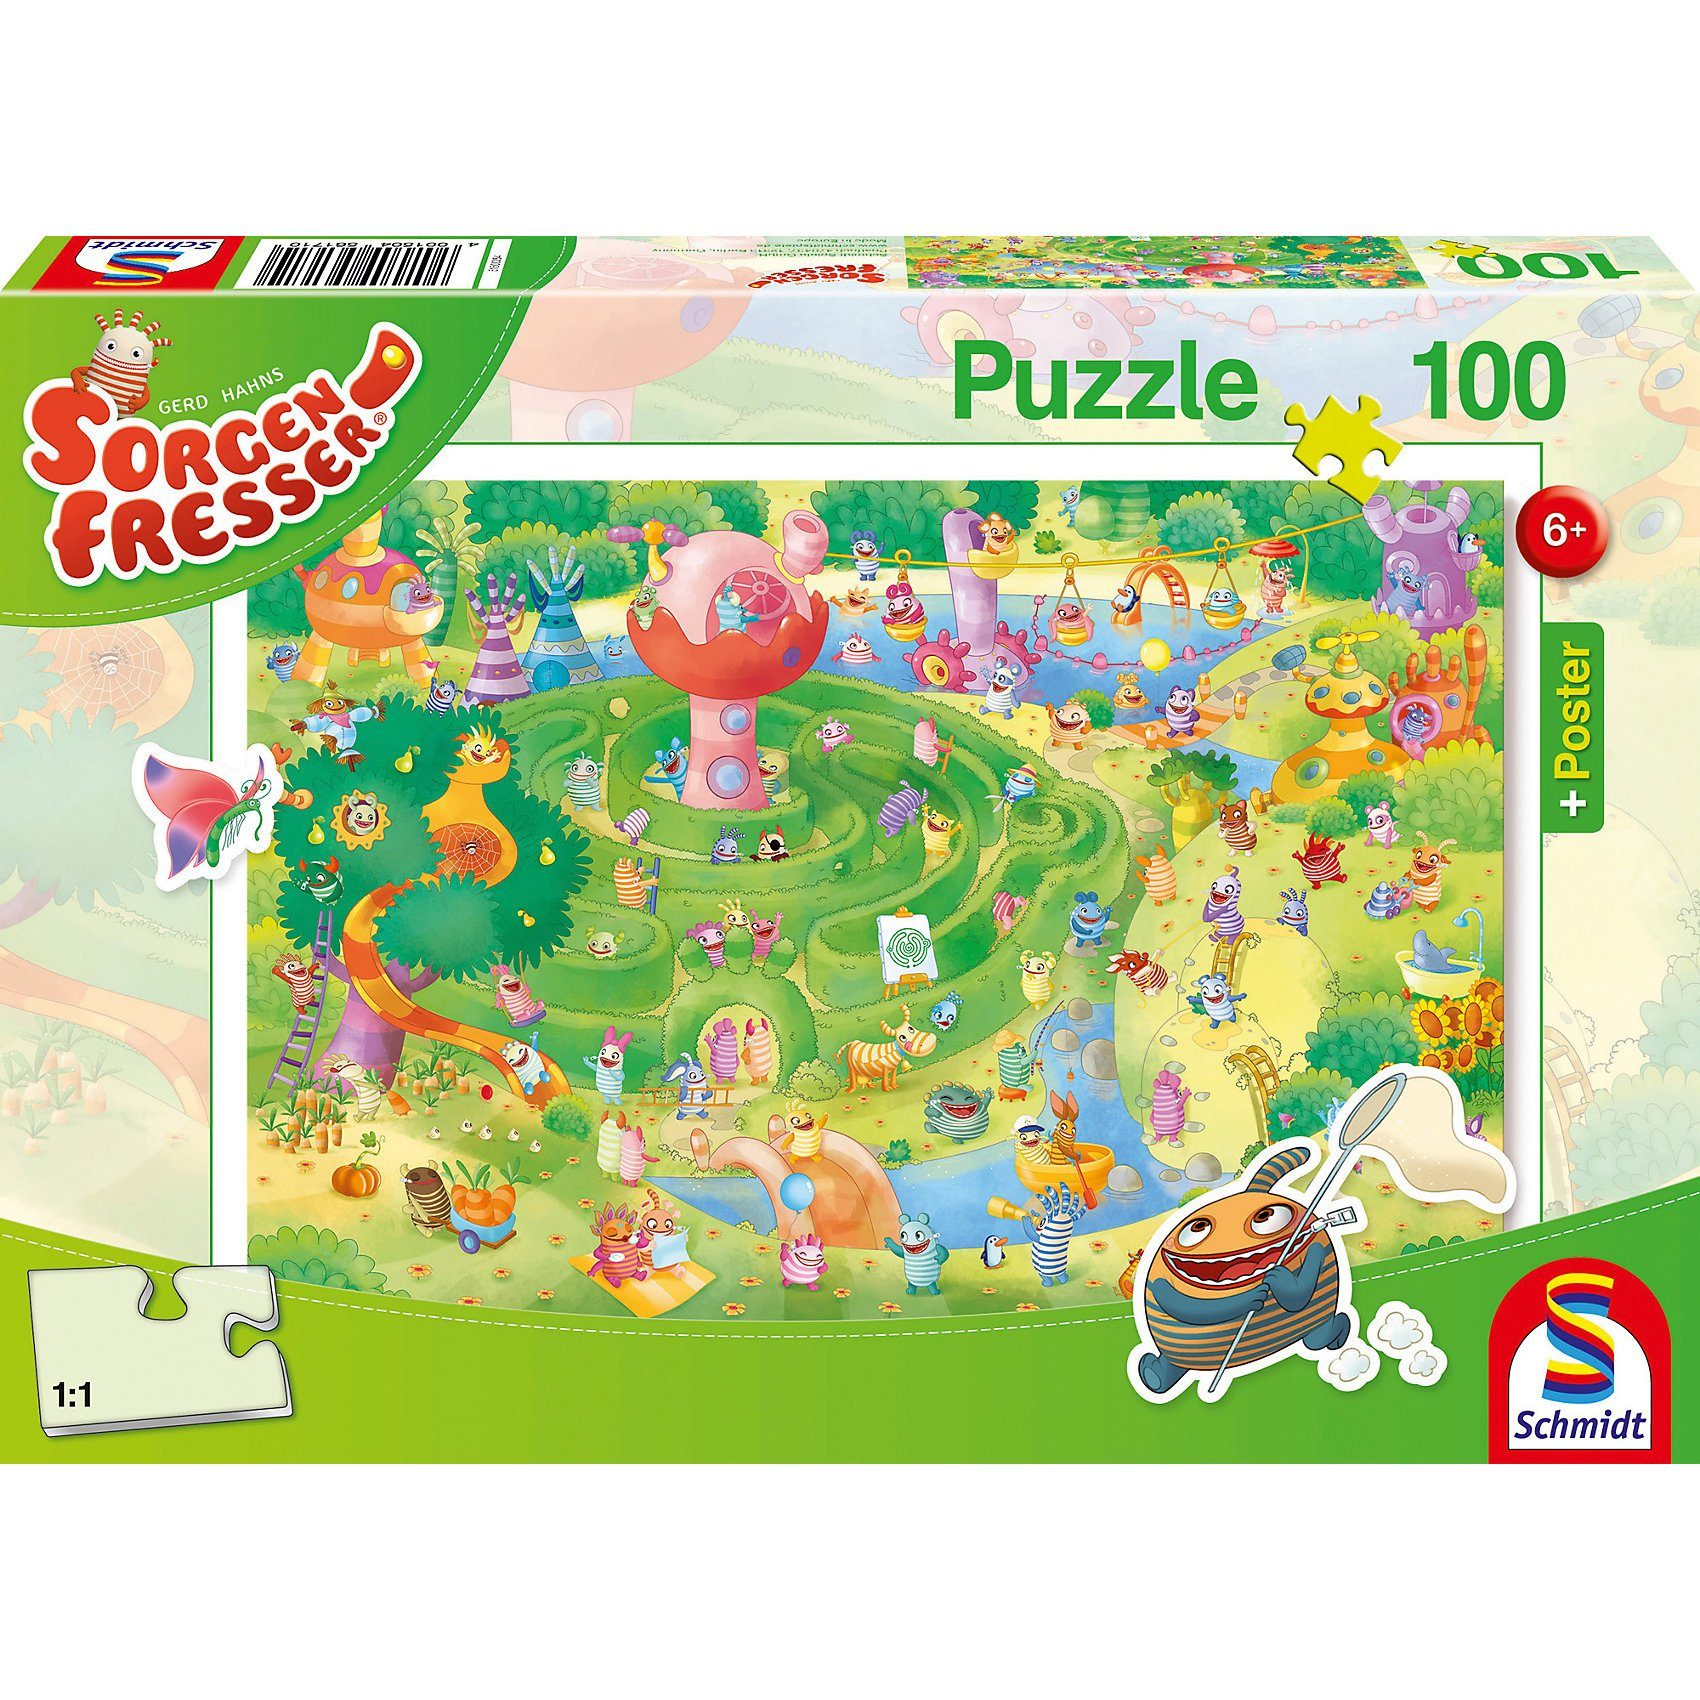 Schmidt Spiele Sorgenfresser: Im Labyrinth, Puzzle inkl. Poster, 100 Teile